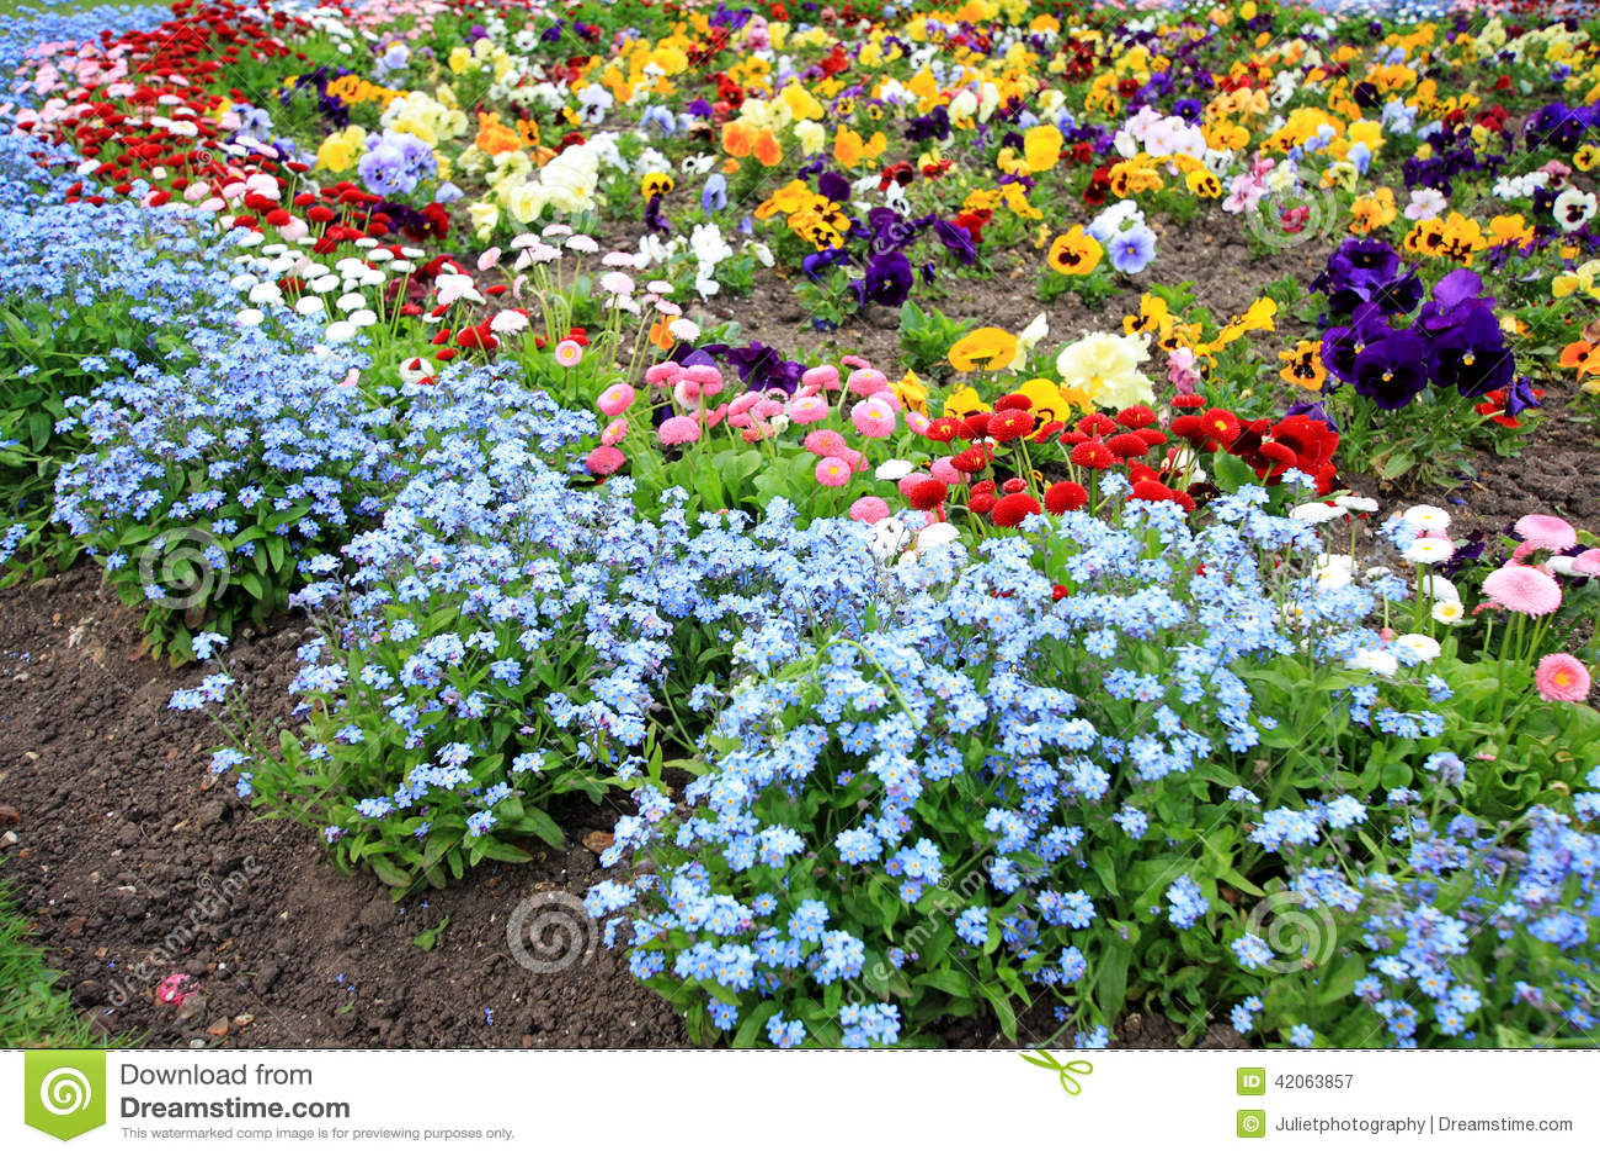 Незабудки: выращивание и уход 82